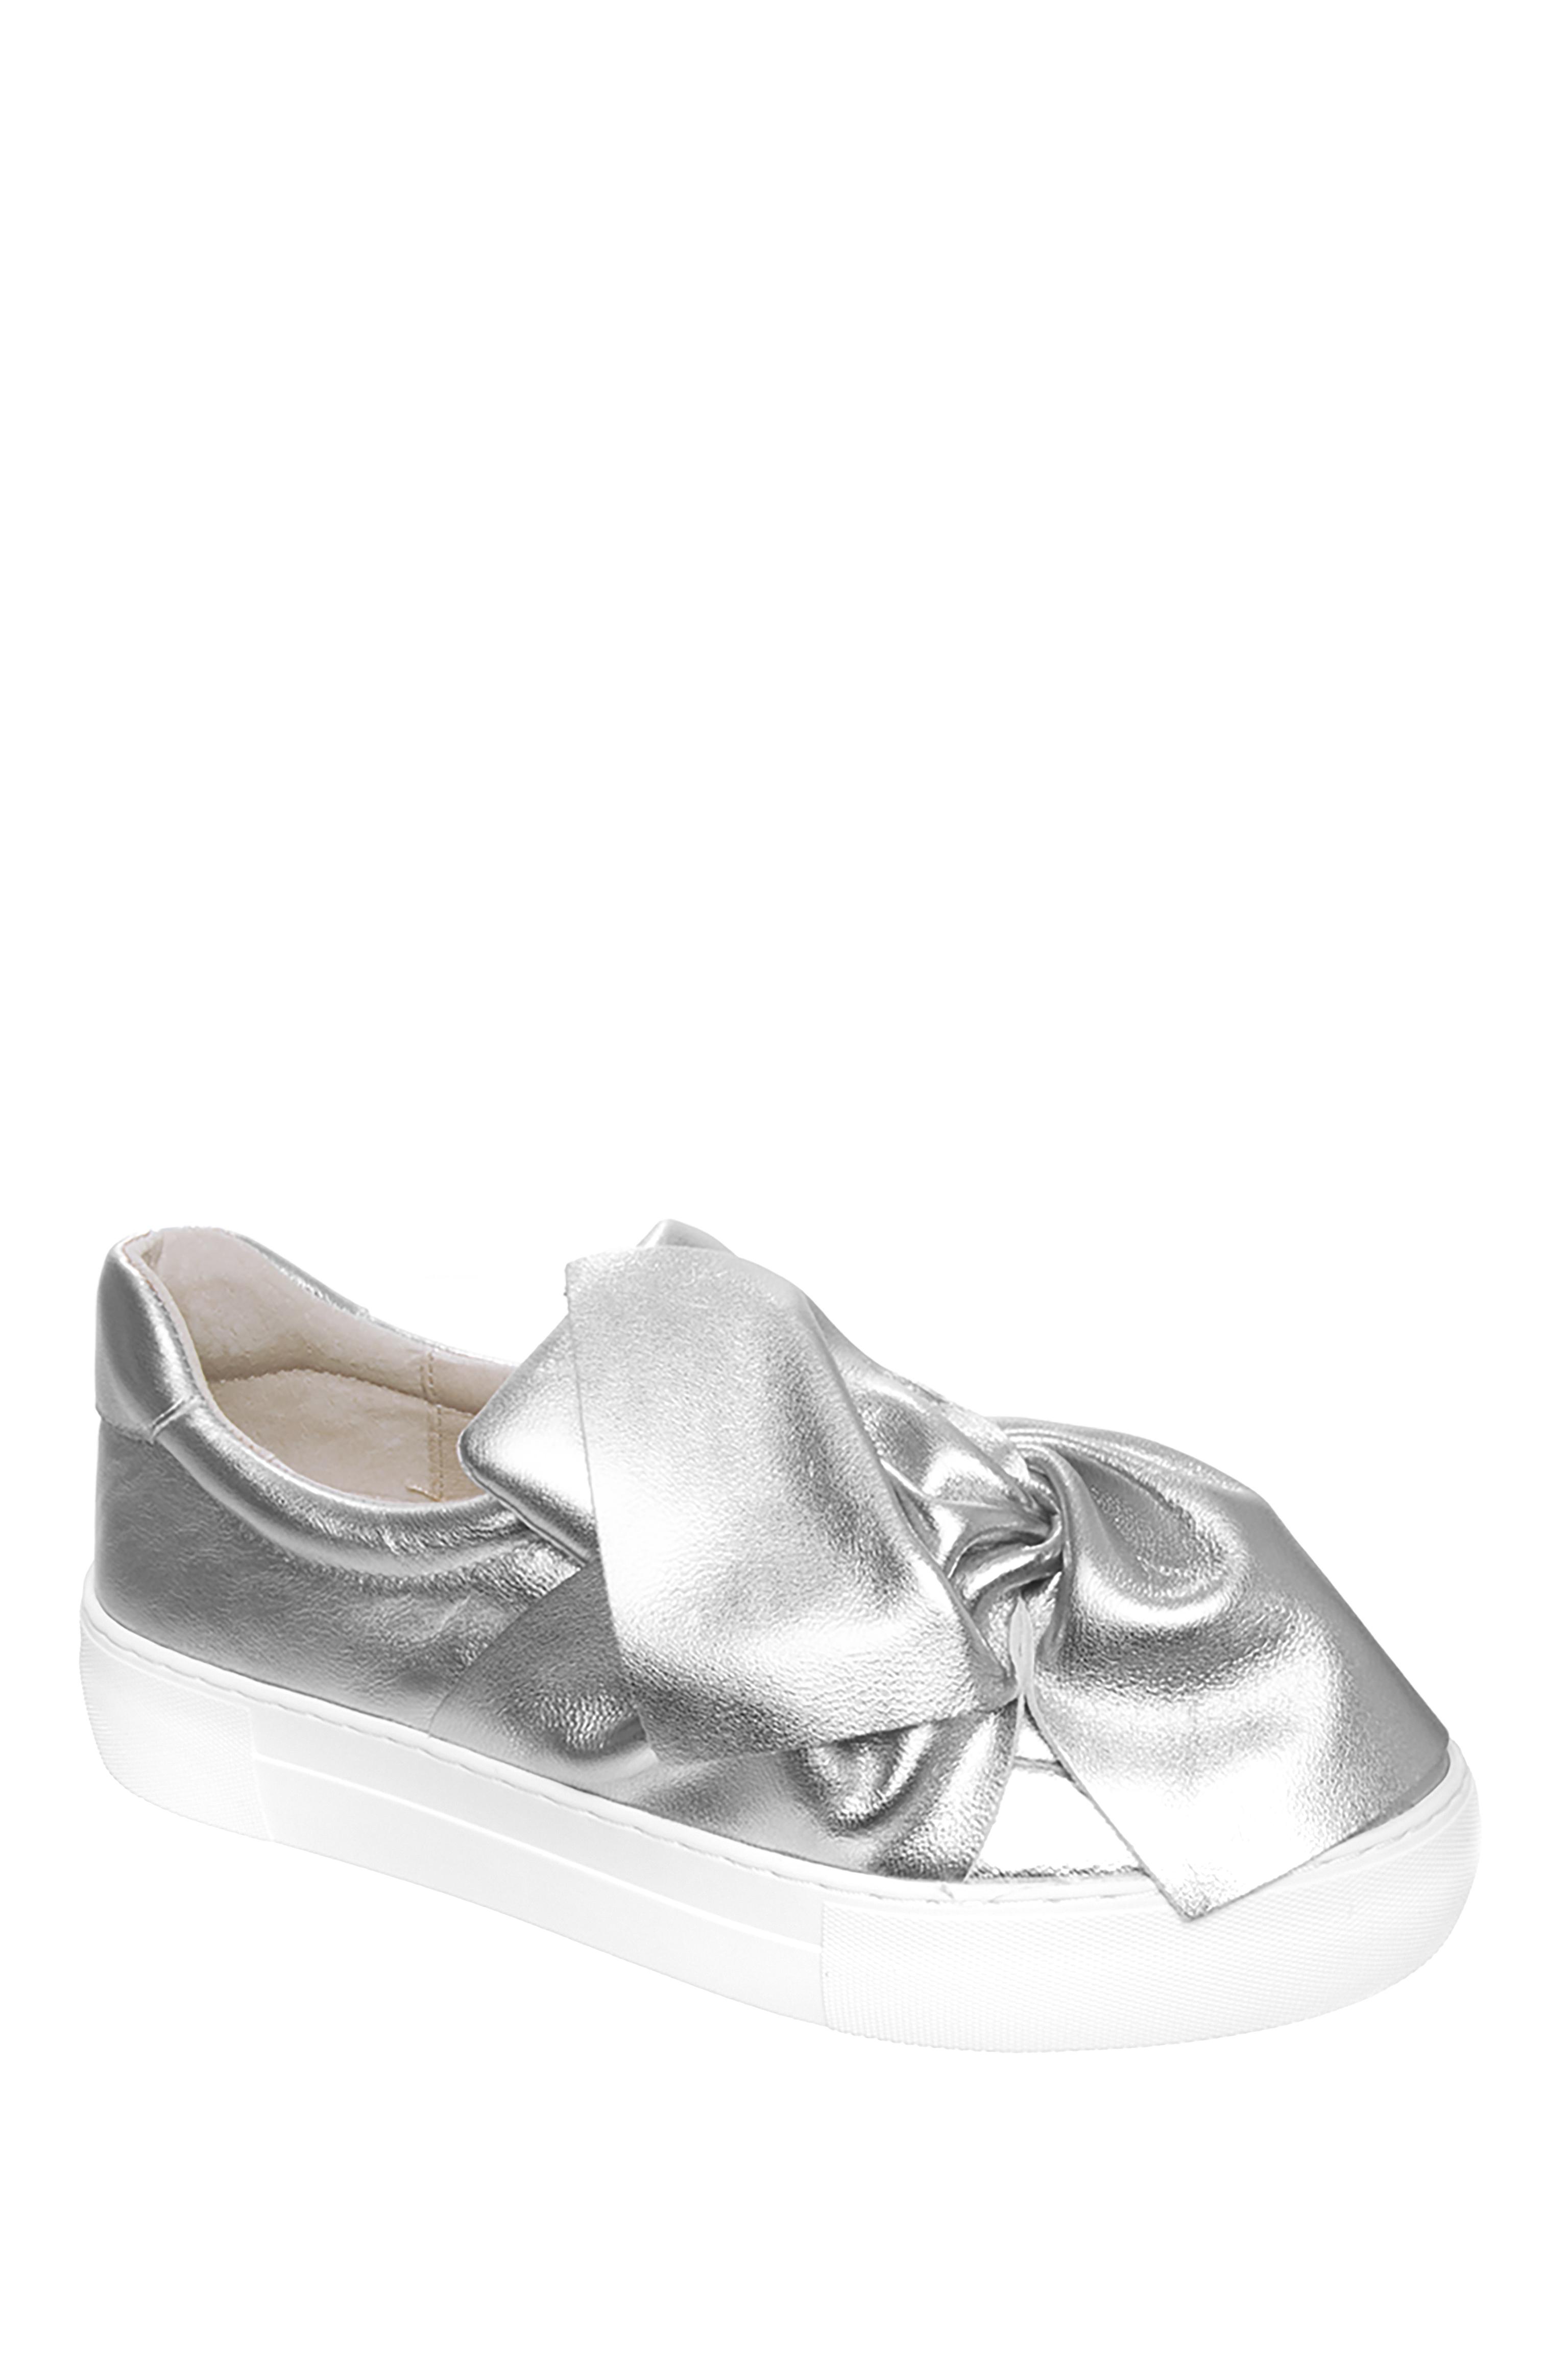 J/Slides Annabelle Platform Sneakers - Silver